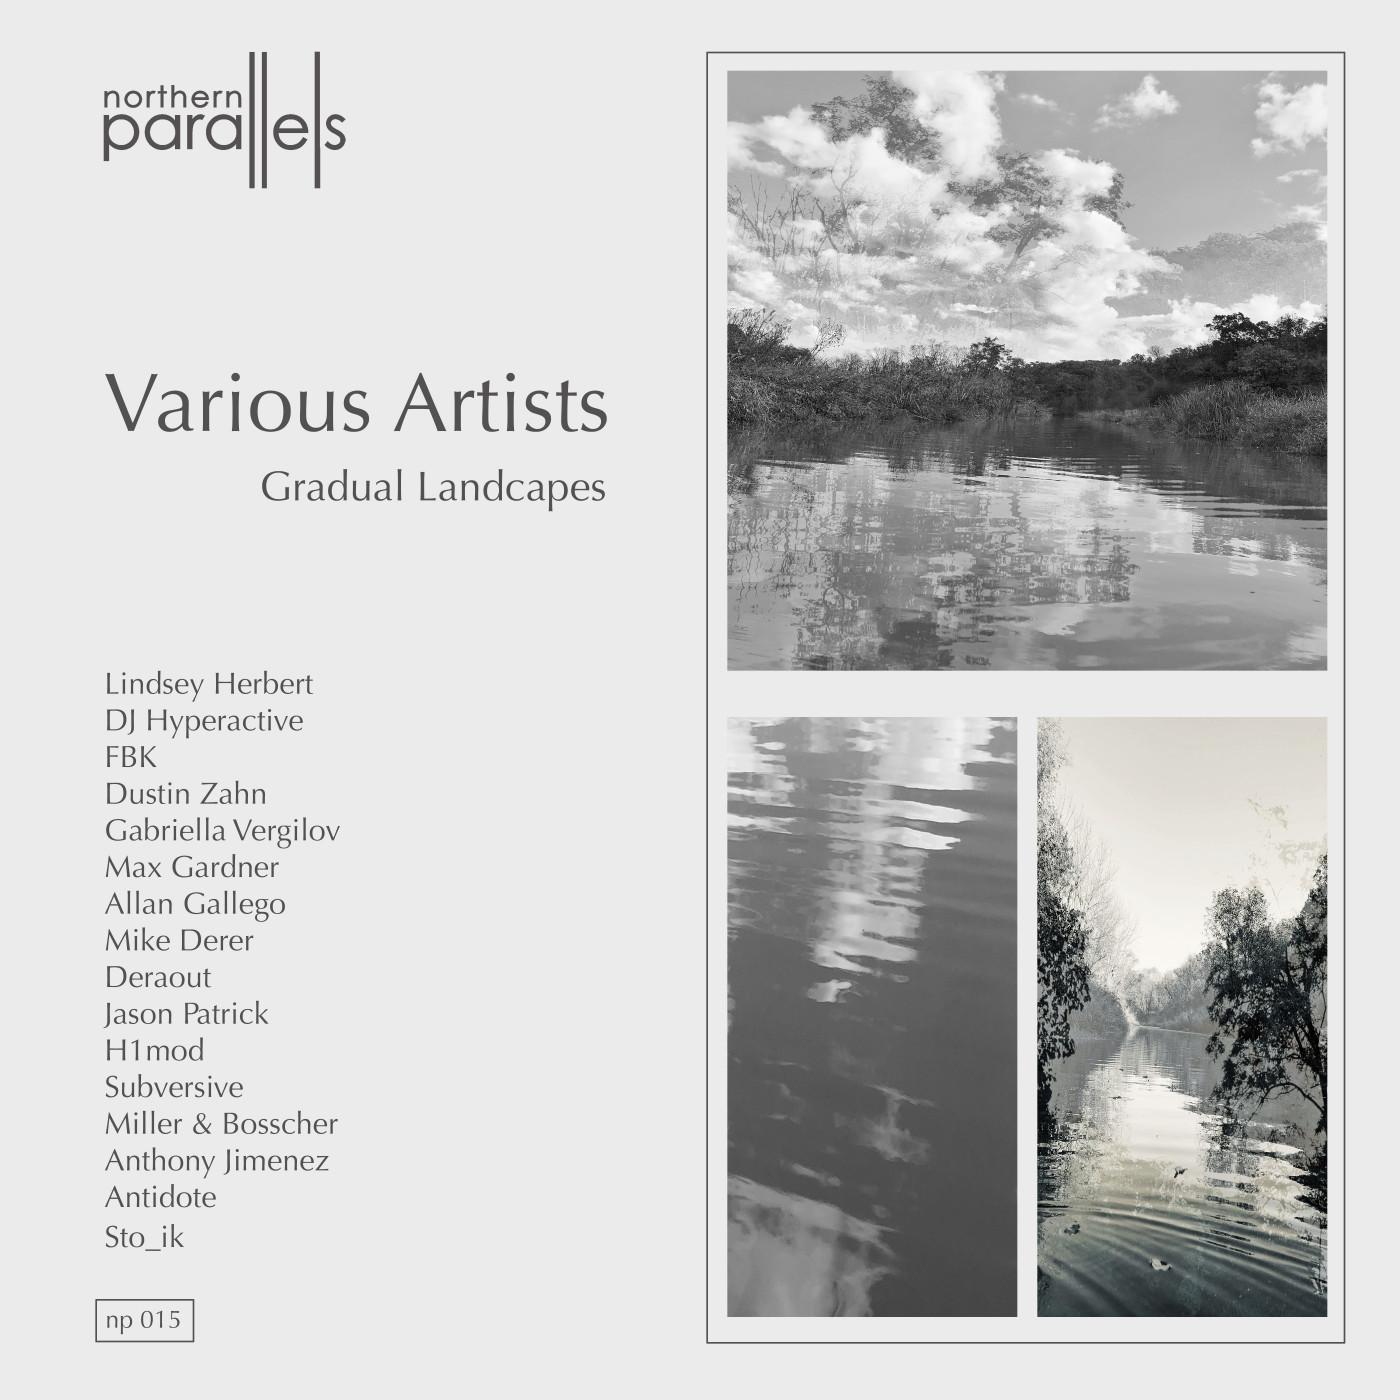 Northern Parallels Gradual Landscapes